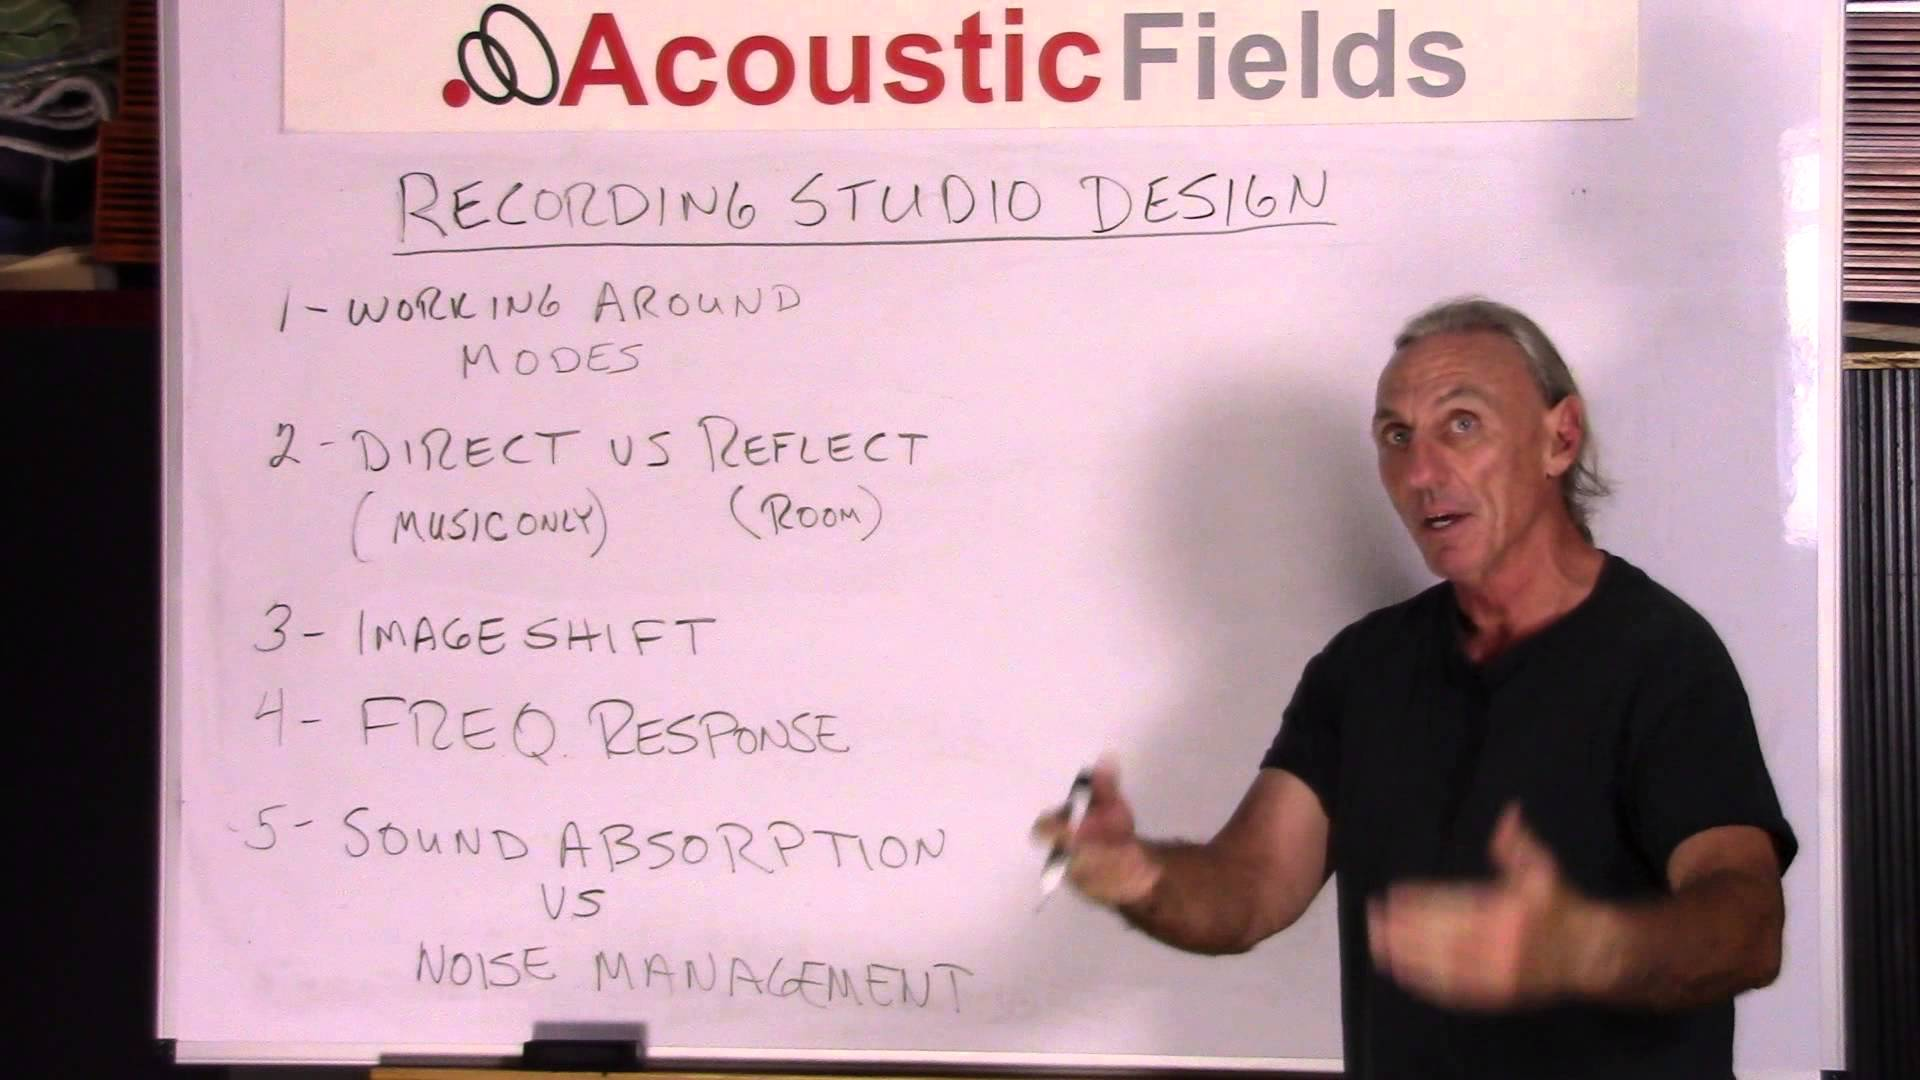 Admirable Top 7 Recording Studio Design Principles Explained Acoustic Fields Largest Home Design Picture Inspirations Pitcheantrous